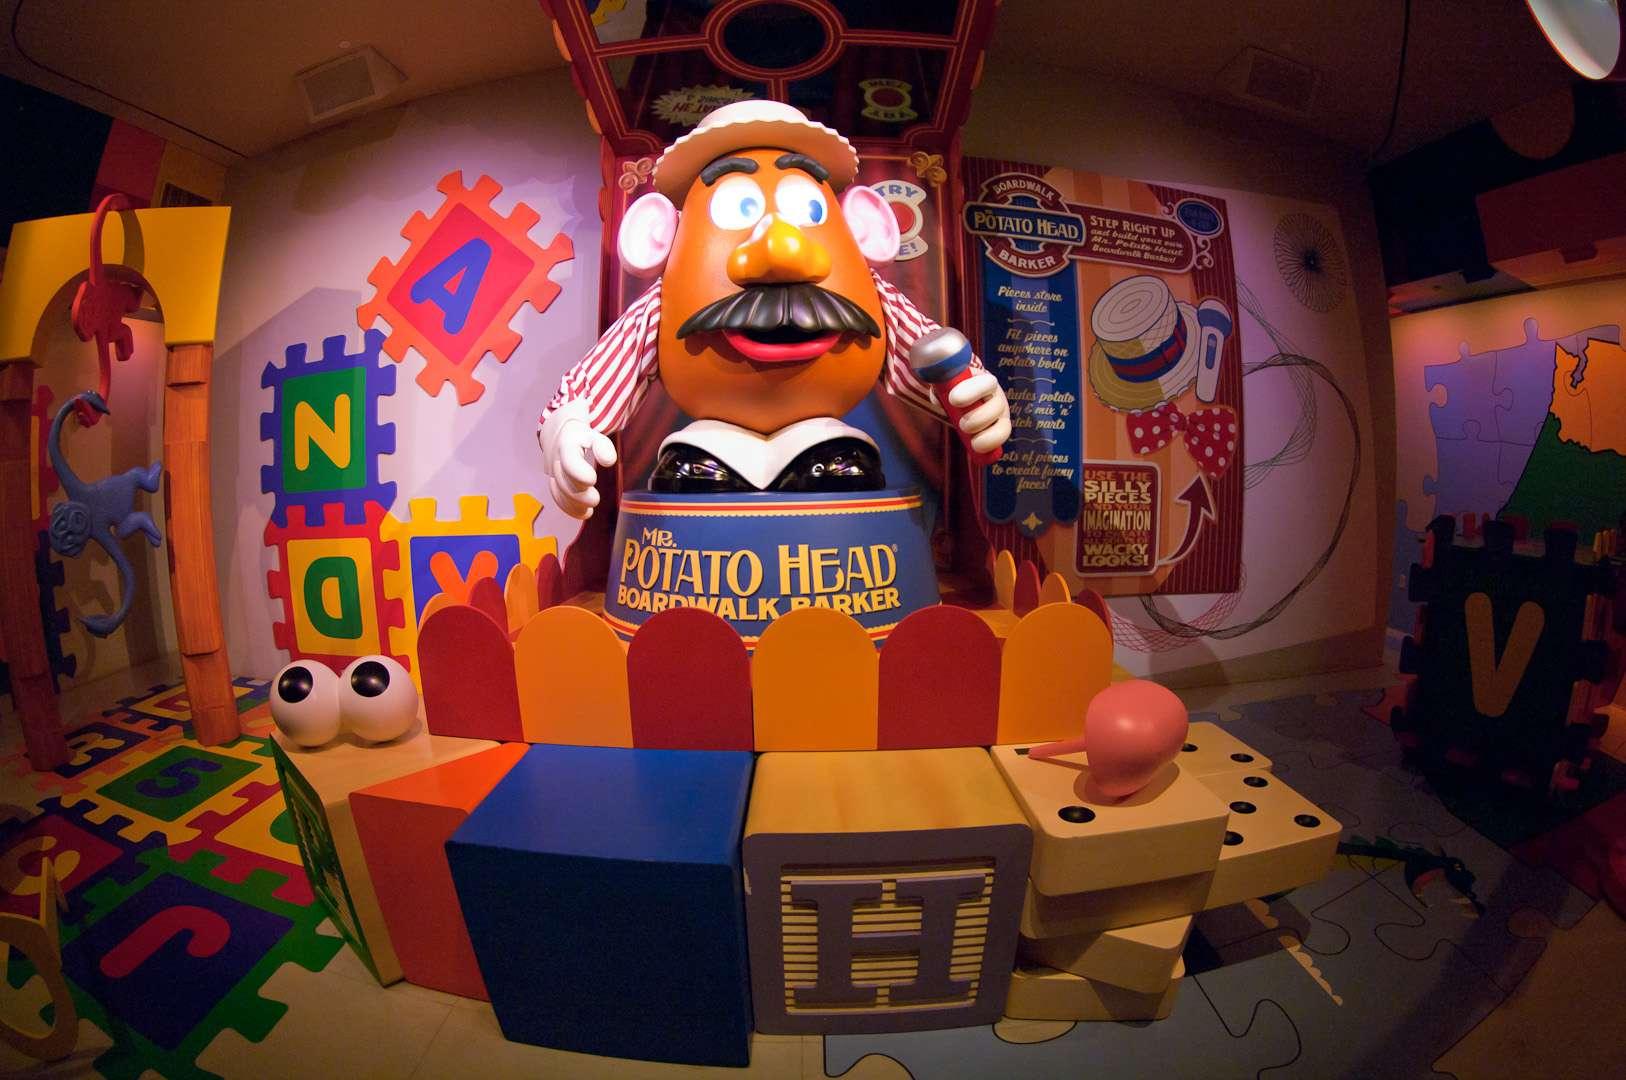 Mr. Potato Head en Toy Story Midway Mania queue